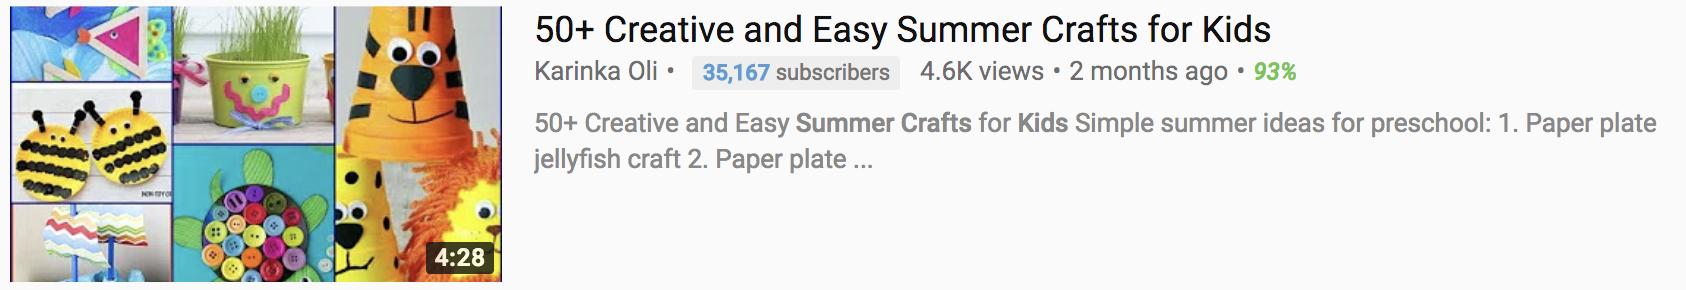 youtube-thumbnail-example-collage